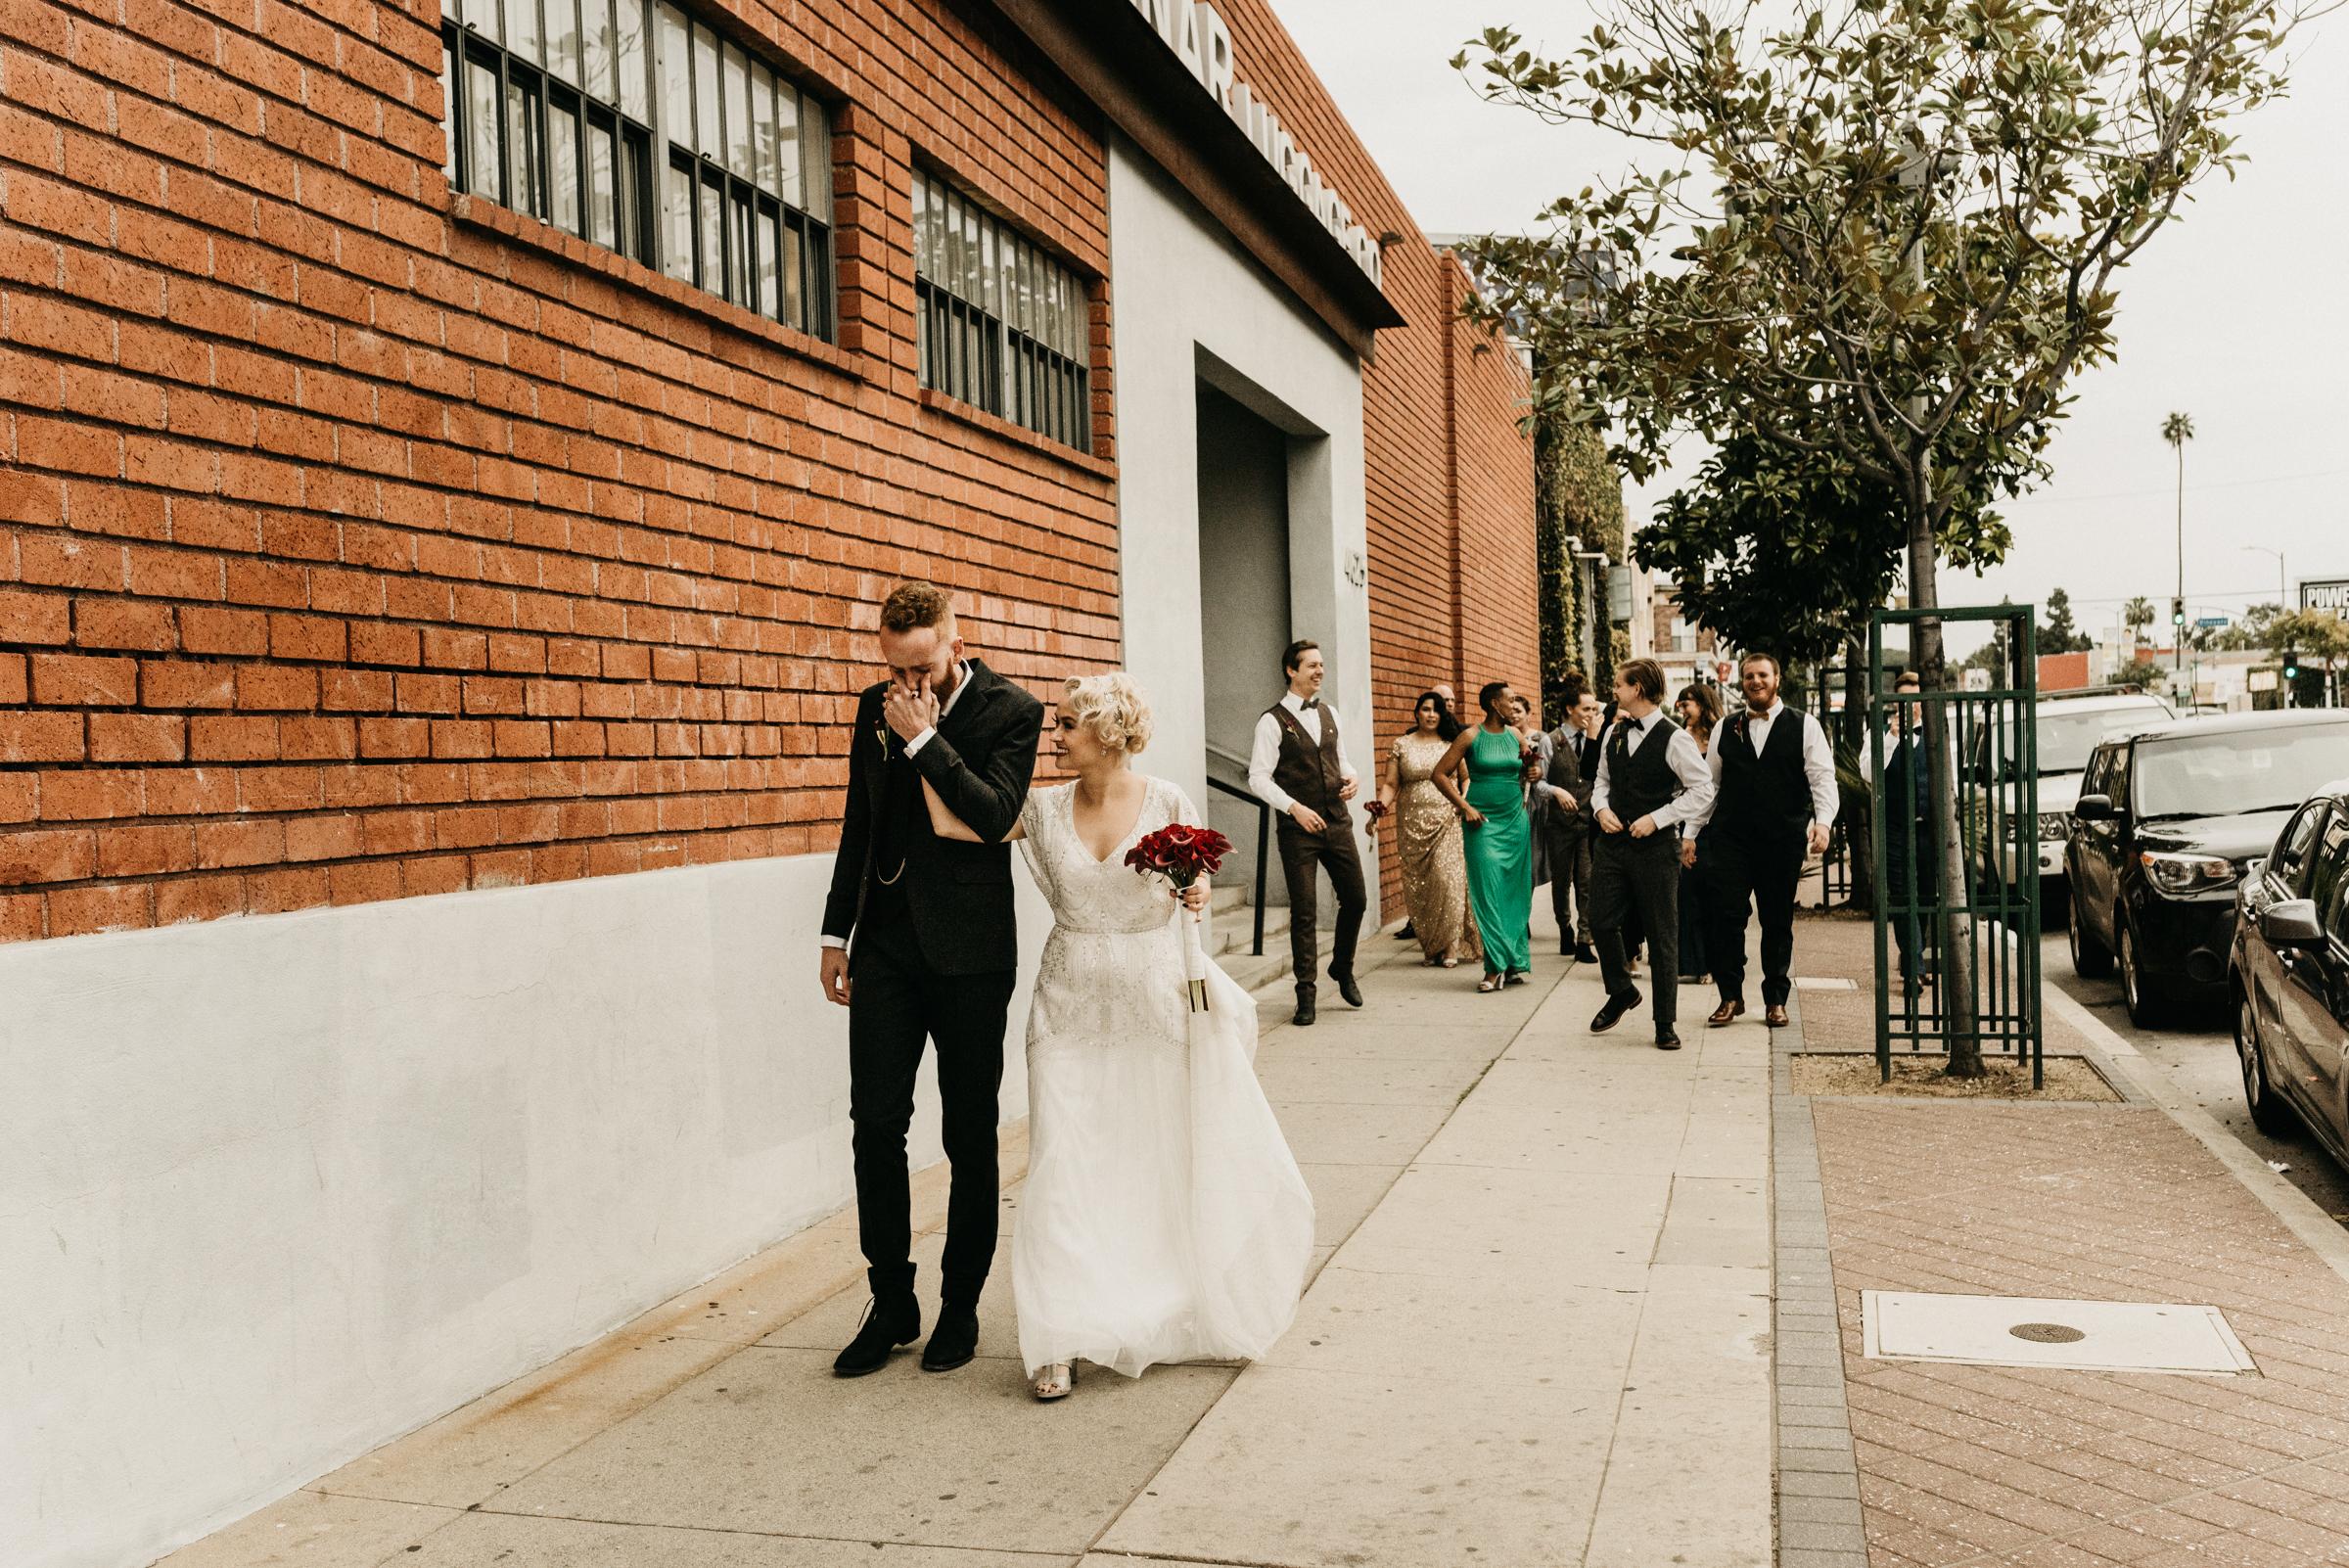 ©Isaiah + Taylor Photography - Studio 11 Wedding, Los Angeles Wedding Photographer-100.jpg